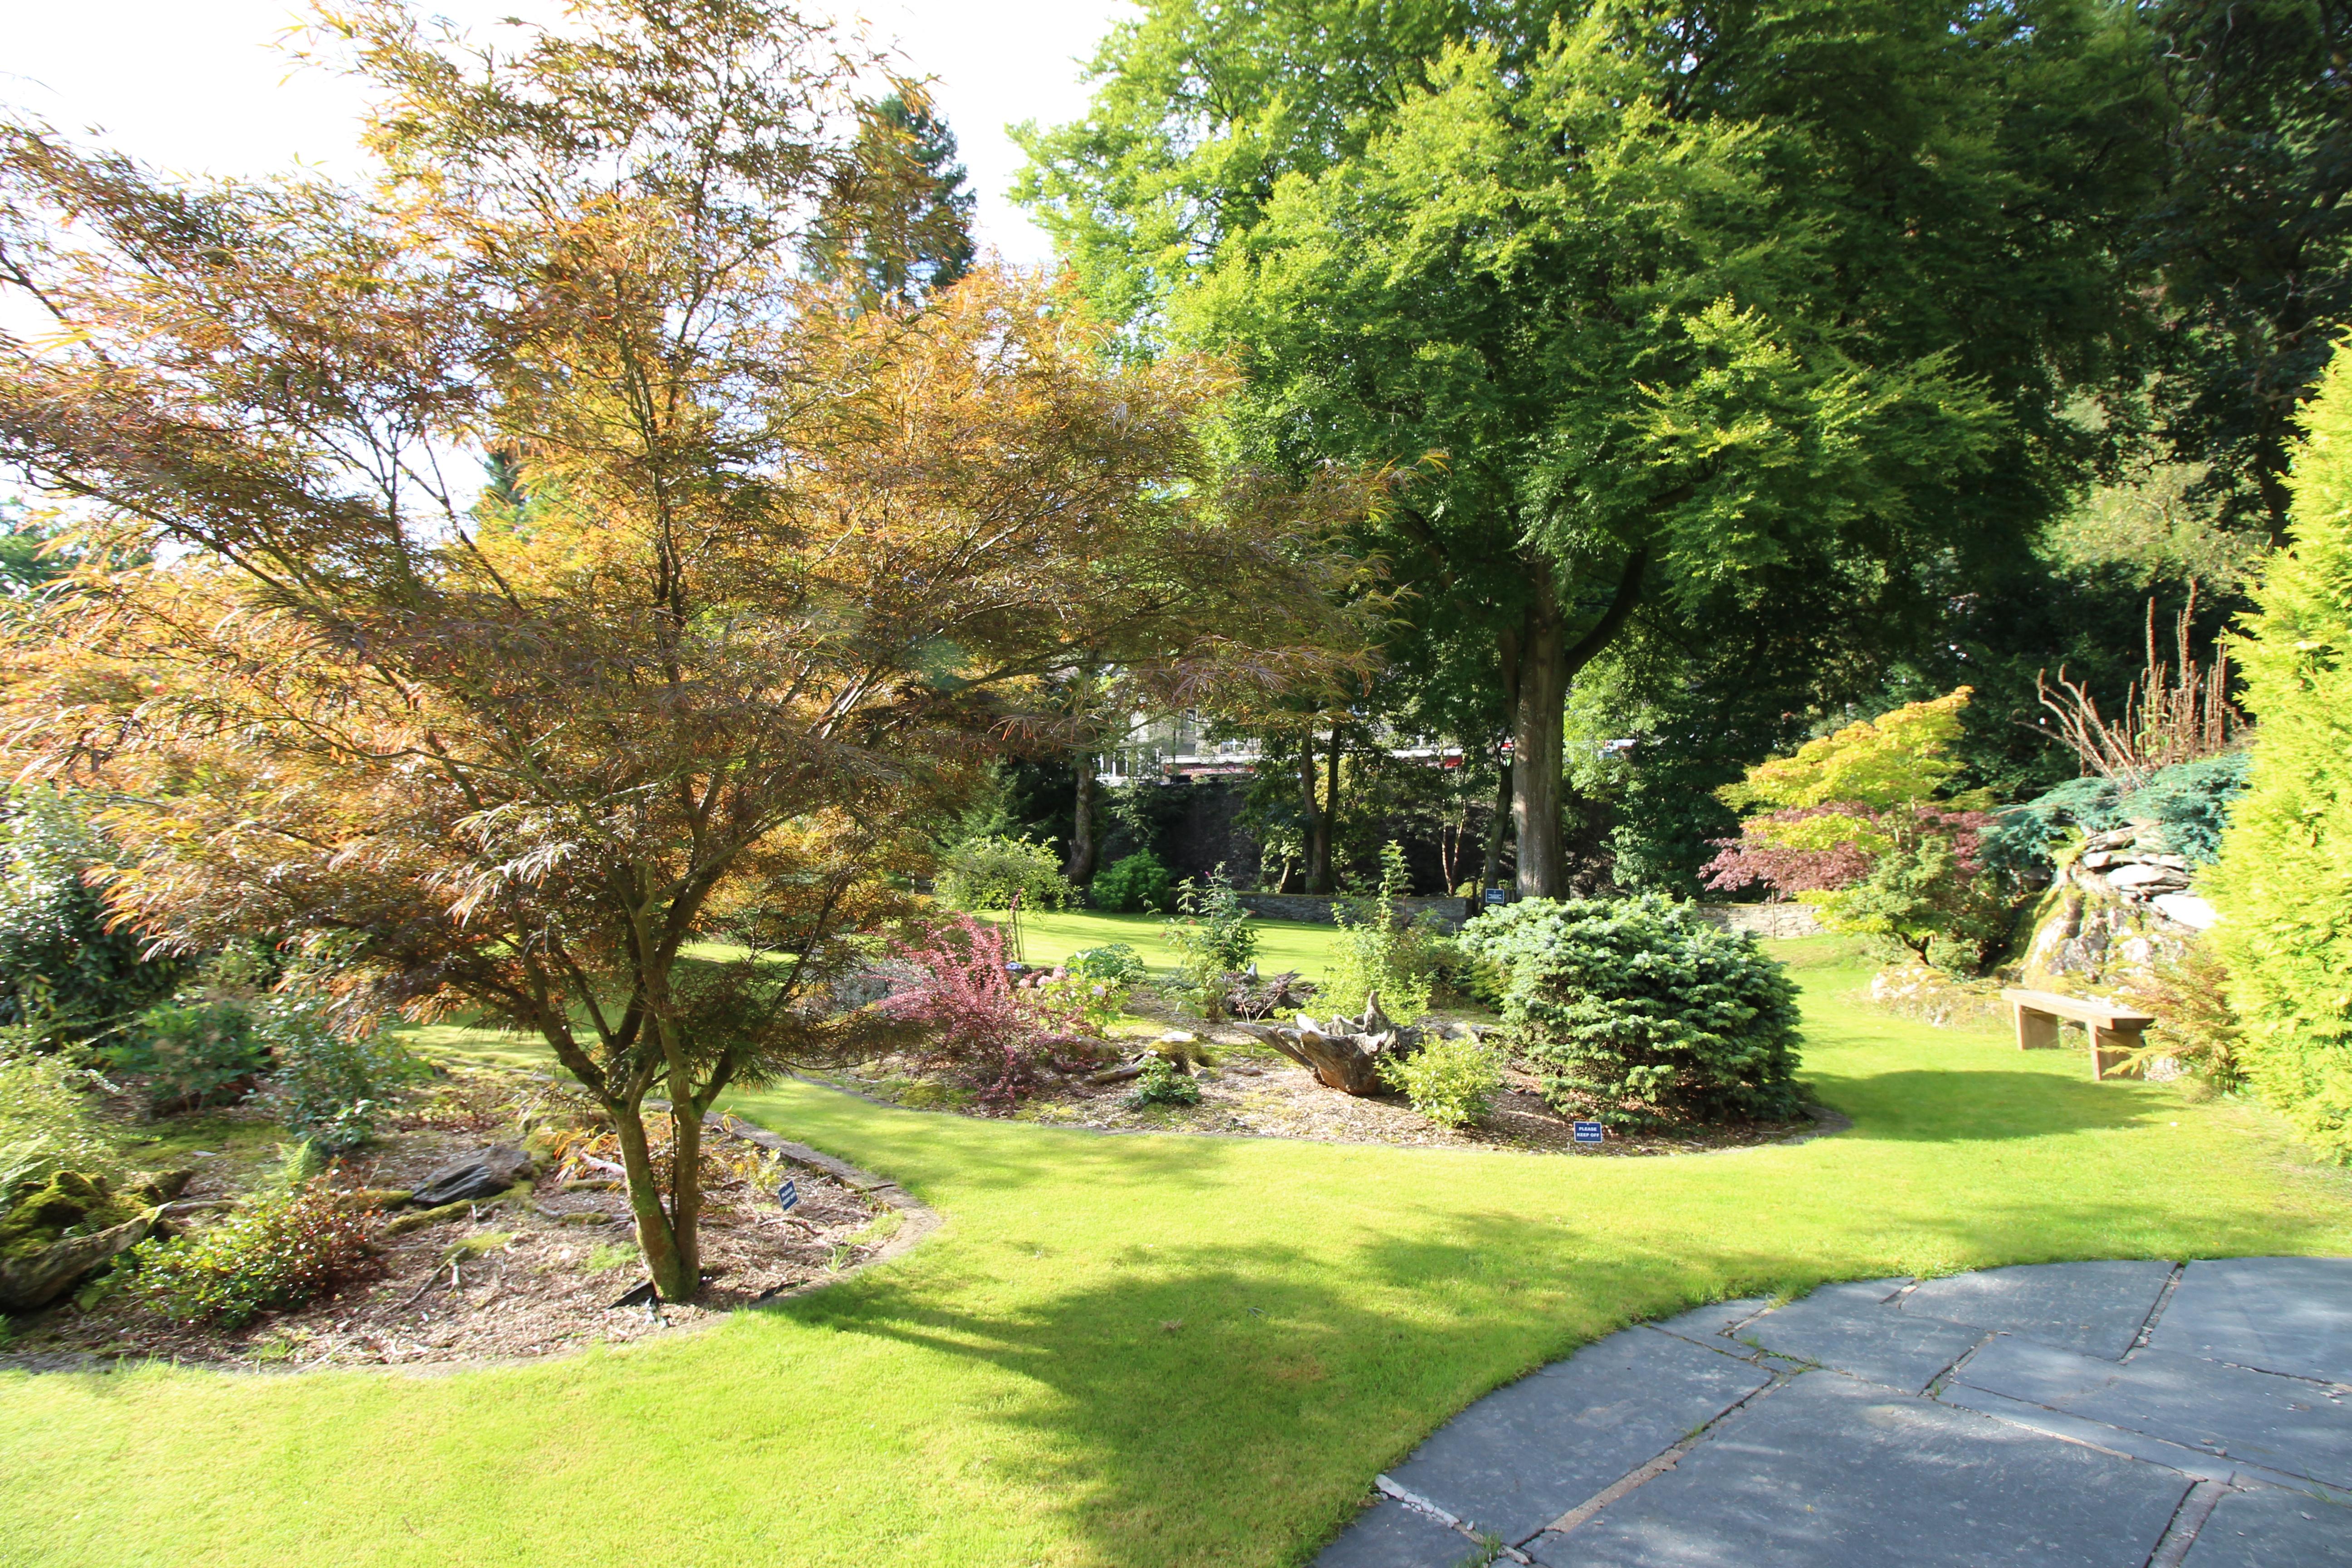 Swn-y-Dwr's landscaped garden 2